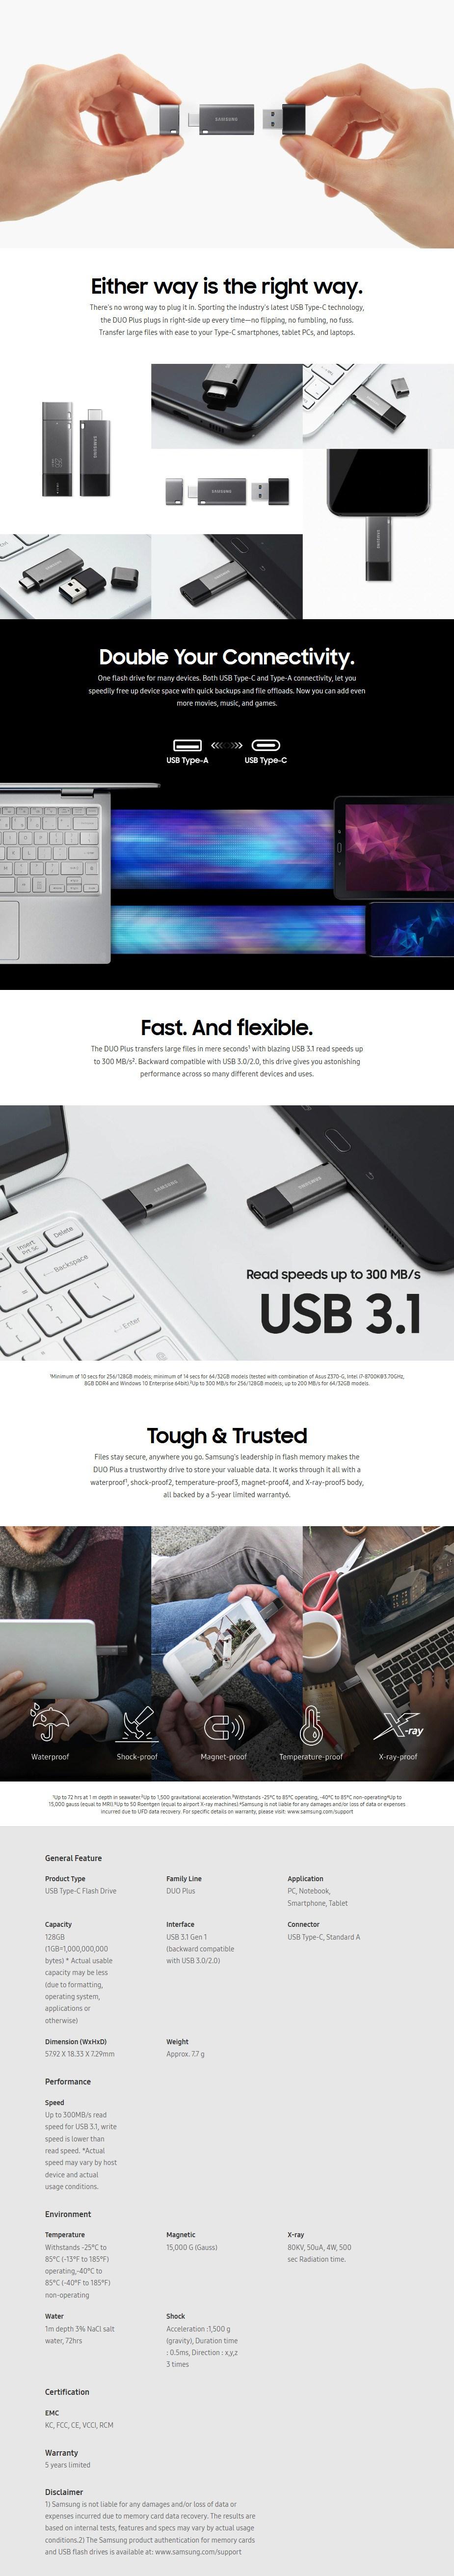 samsung-muf128dbapc-128gb-duo-plus-usbc-flash-drive-ac35193-6.jpg